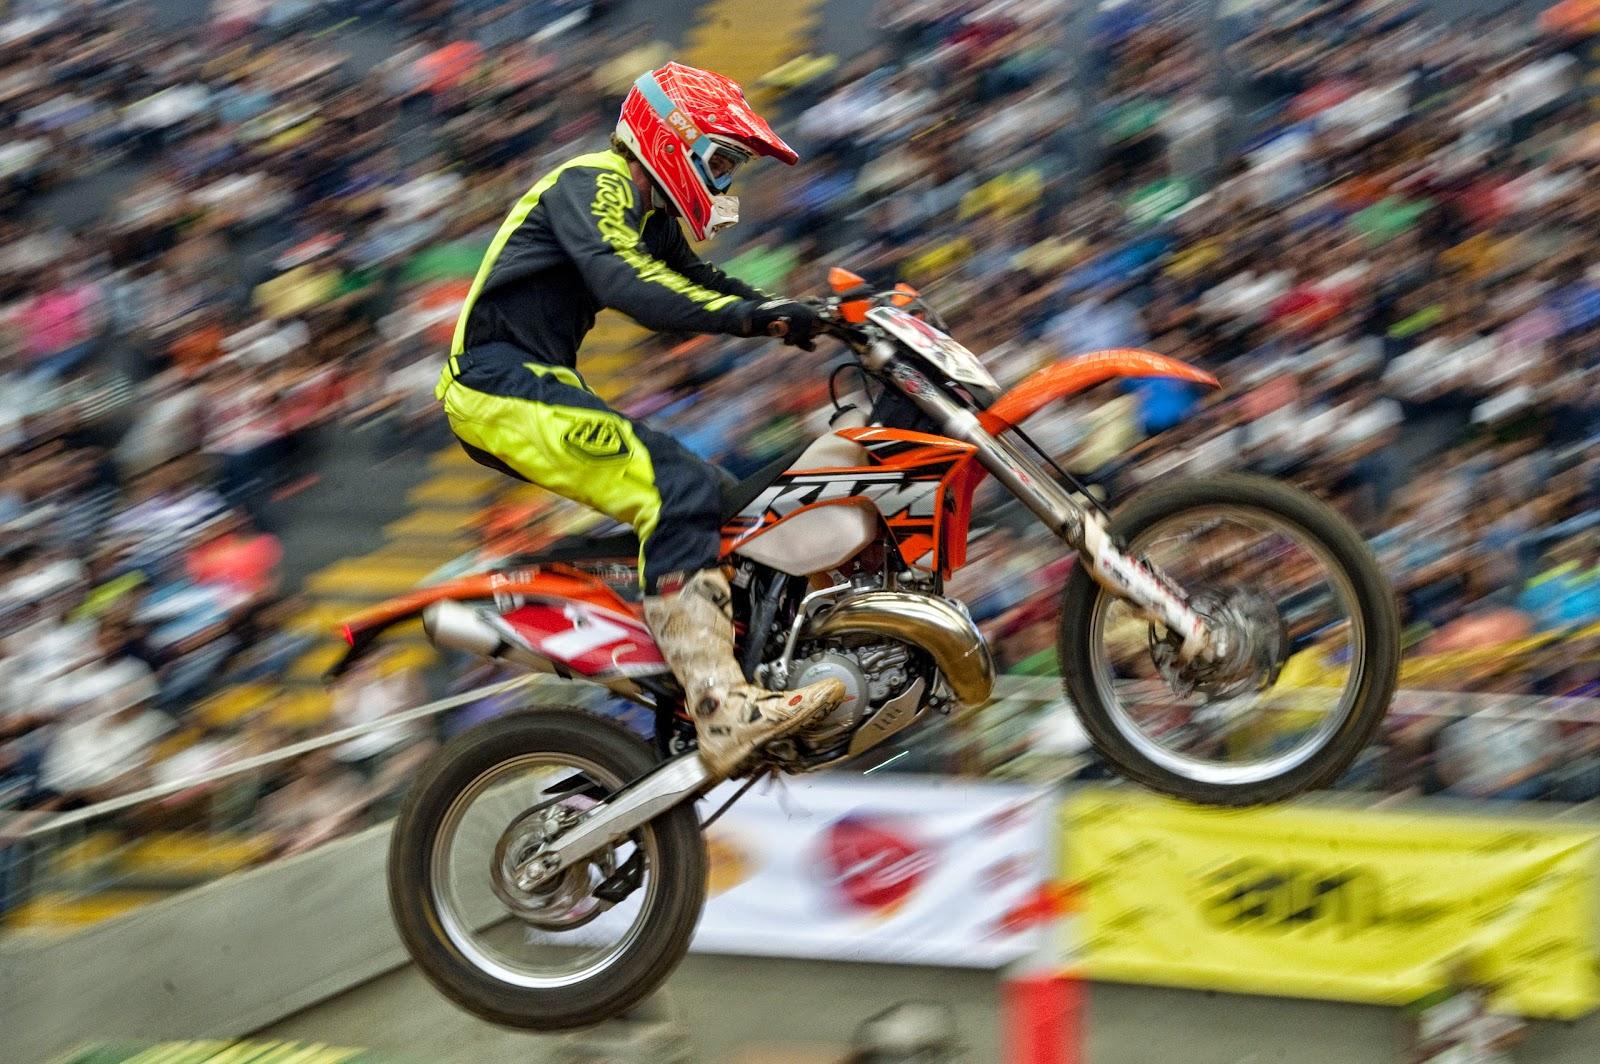 Enduro Cross International in Medellin HD Pictures